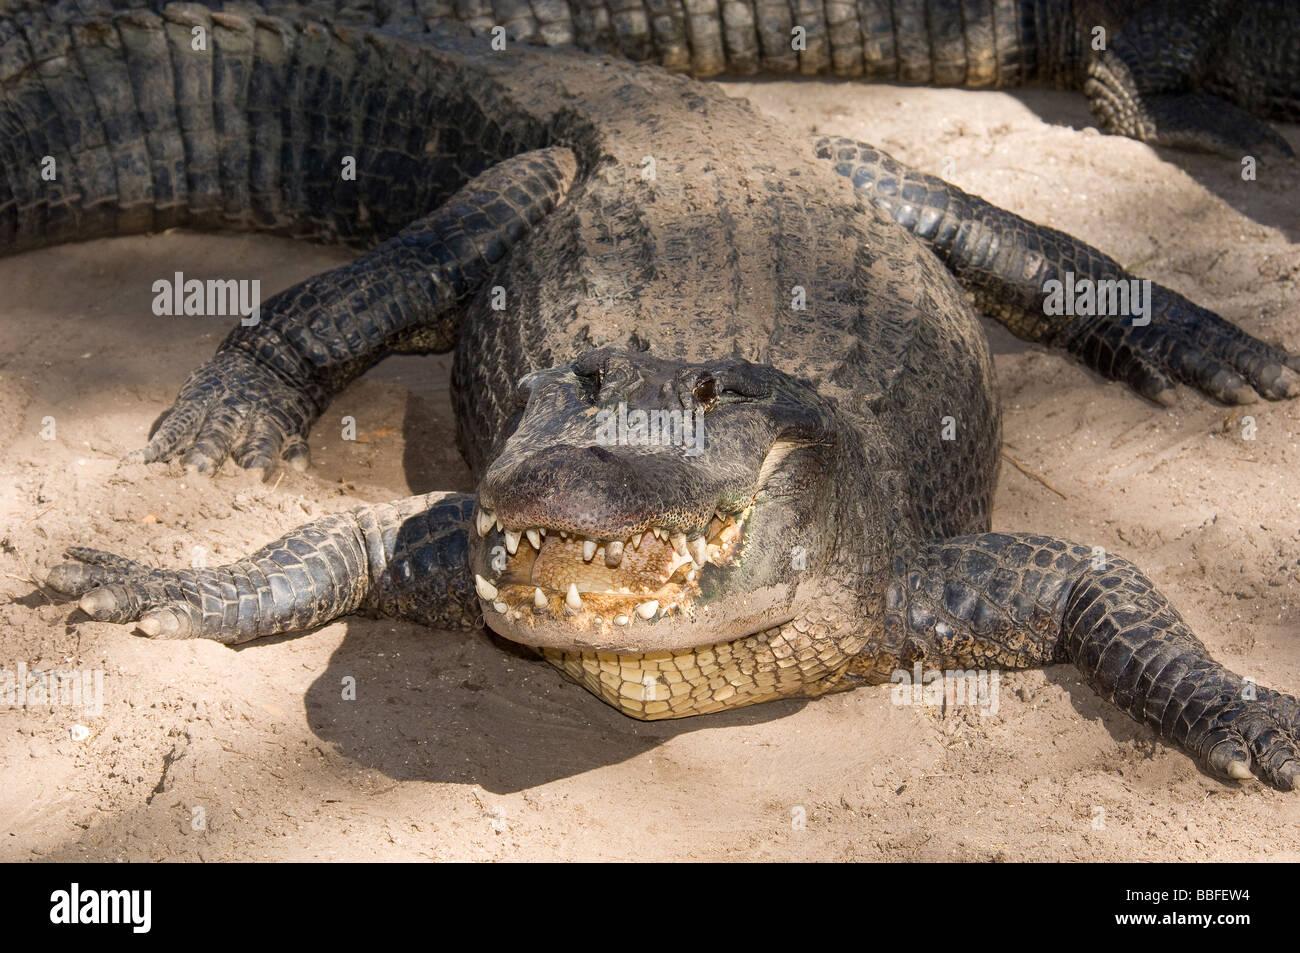 American Alligator Alligator mississippiensis Florida - Stock Image